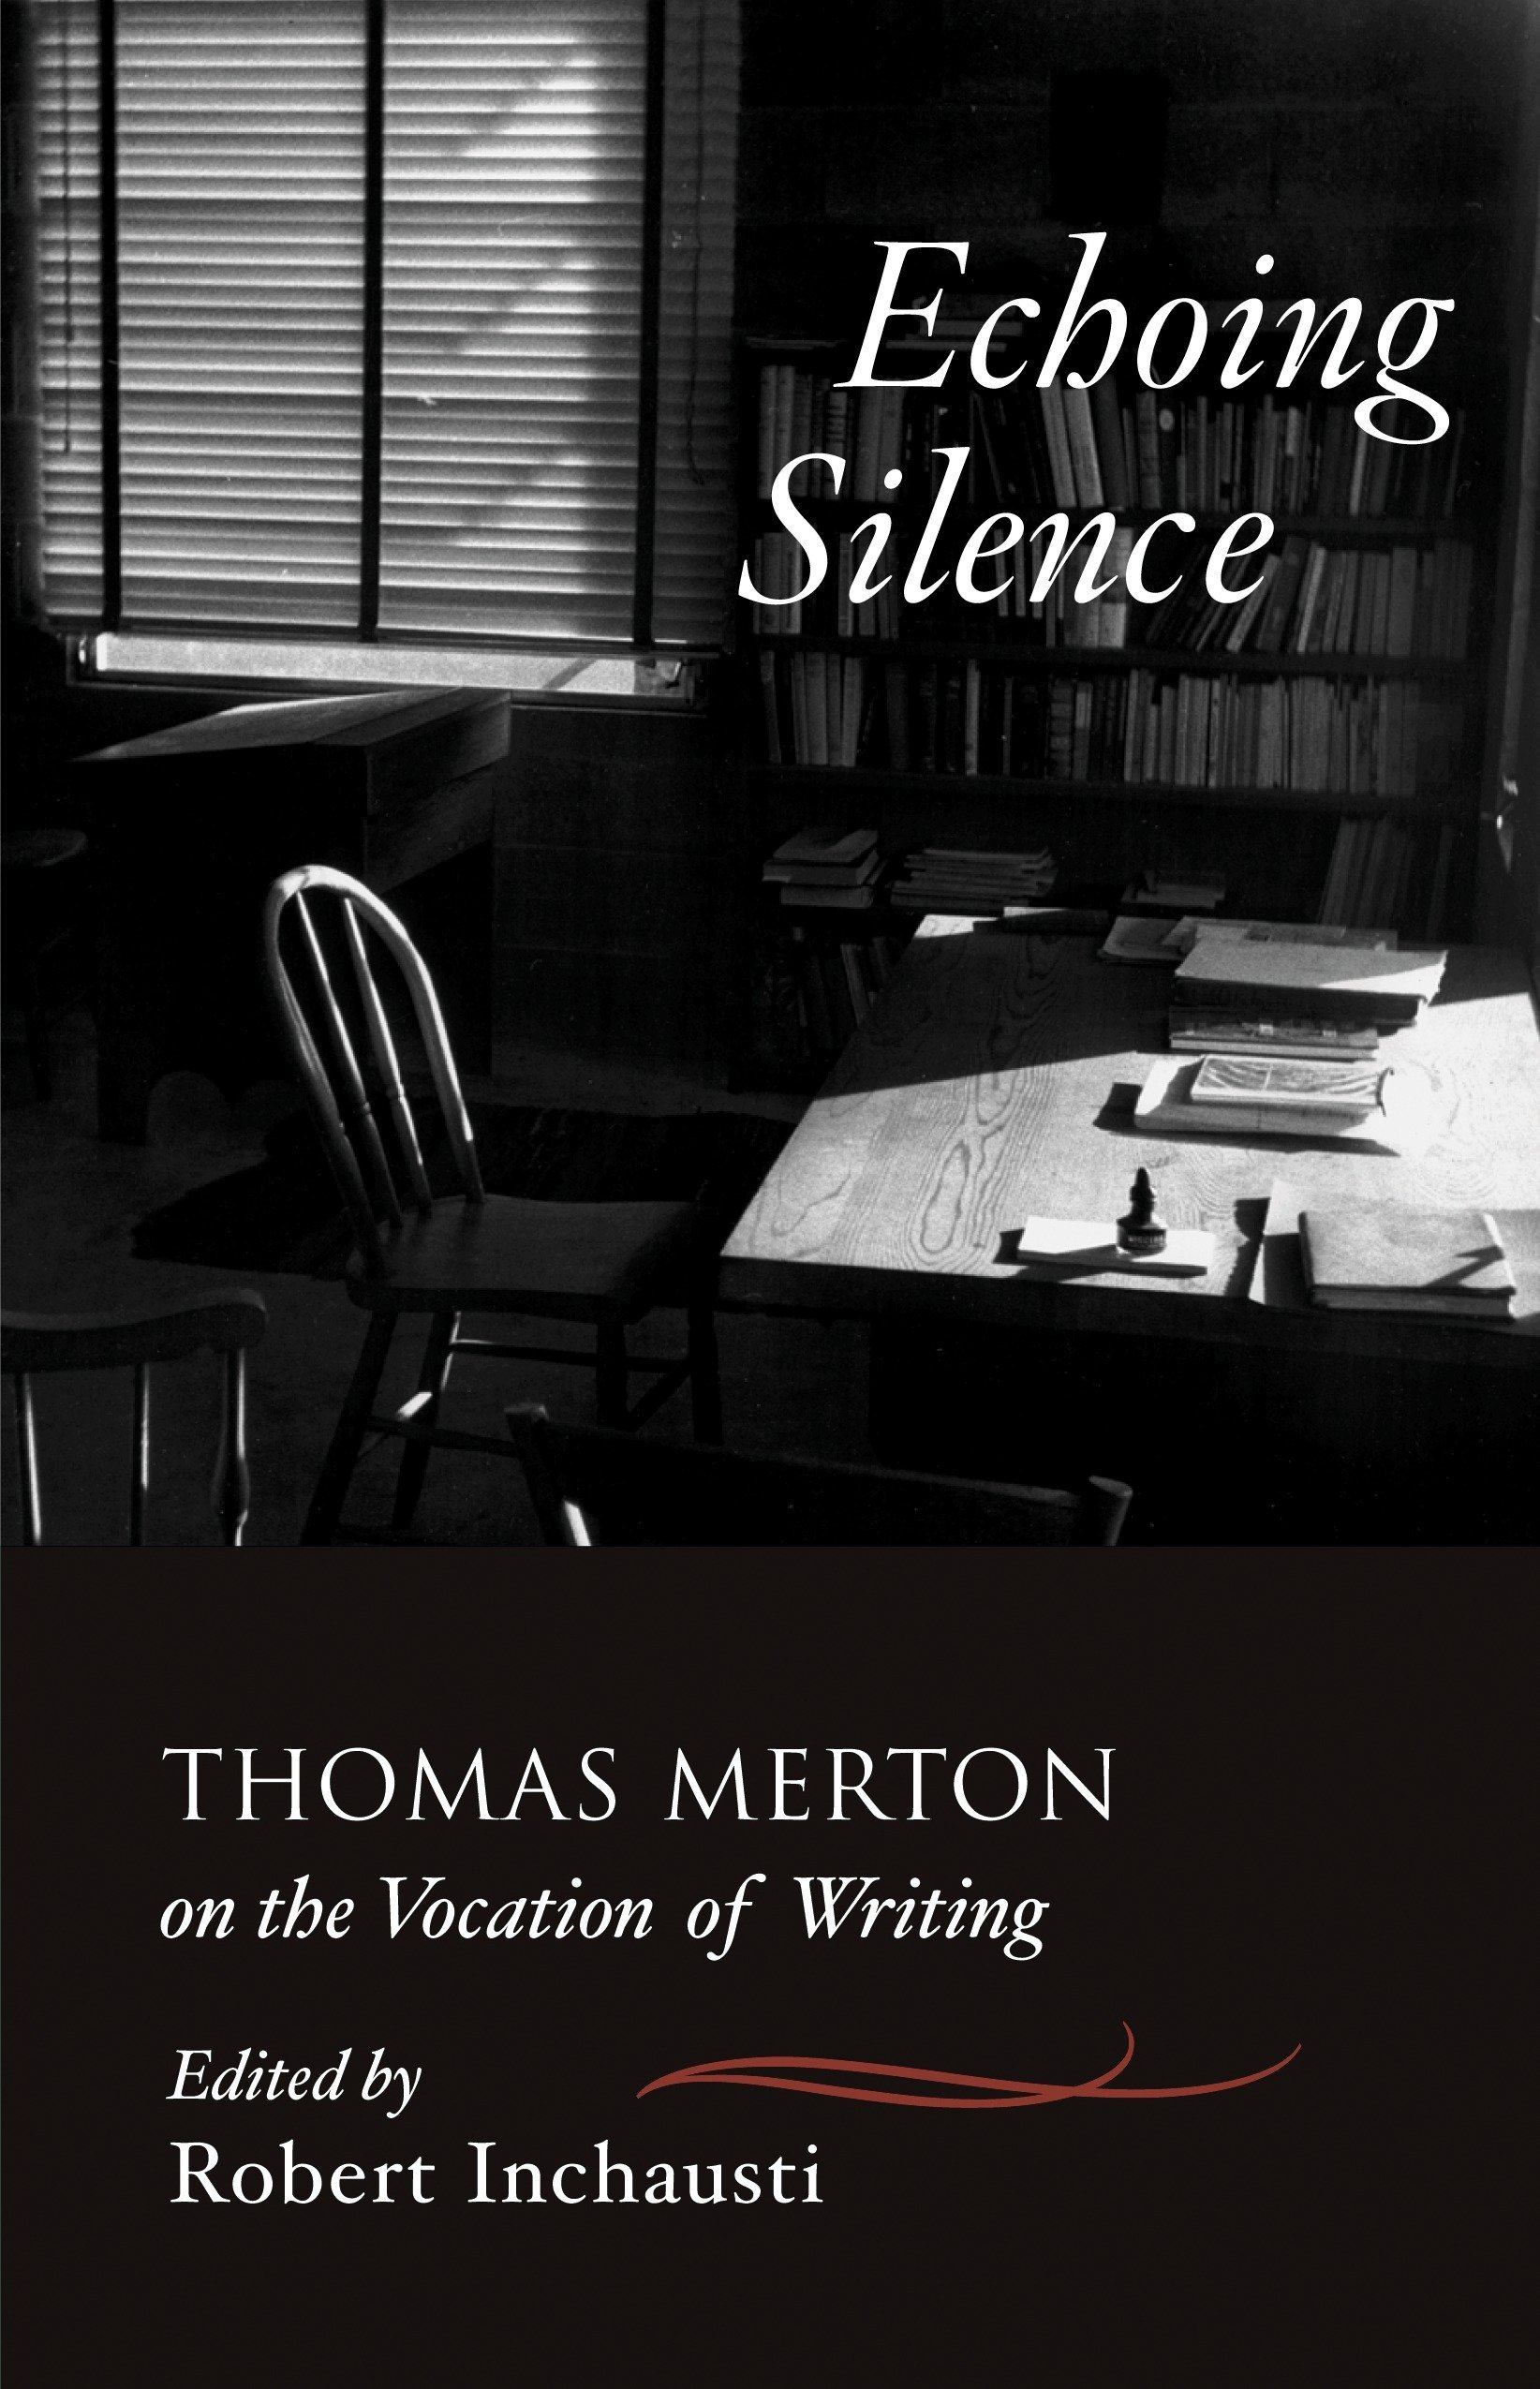 Echoing Silence: Thomas Merton on the Vocation of Writing pdf